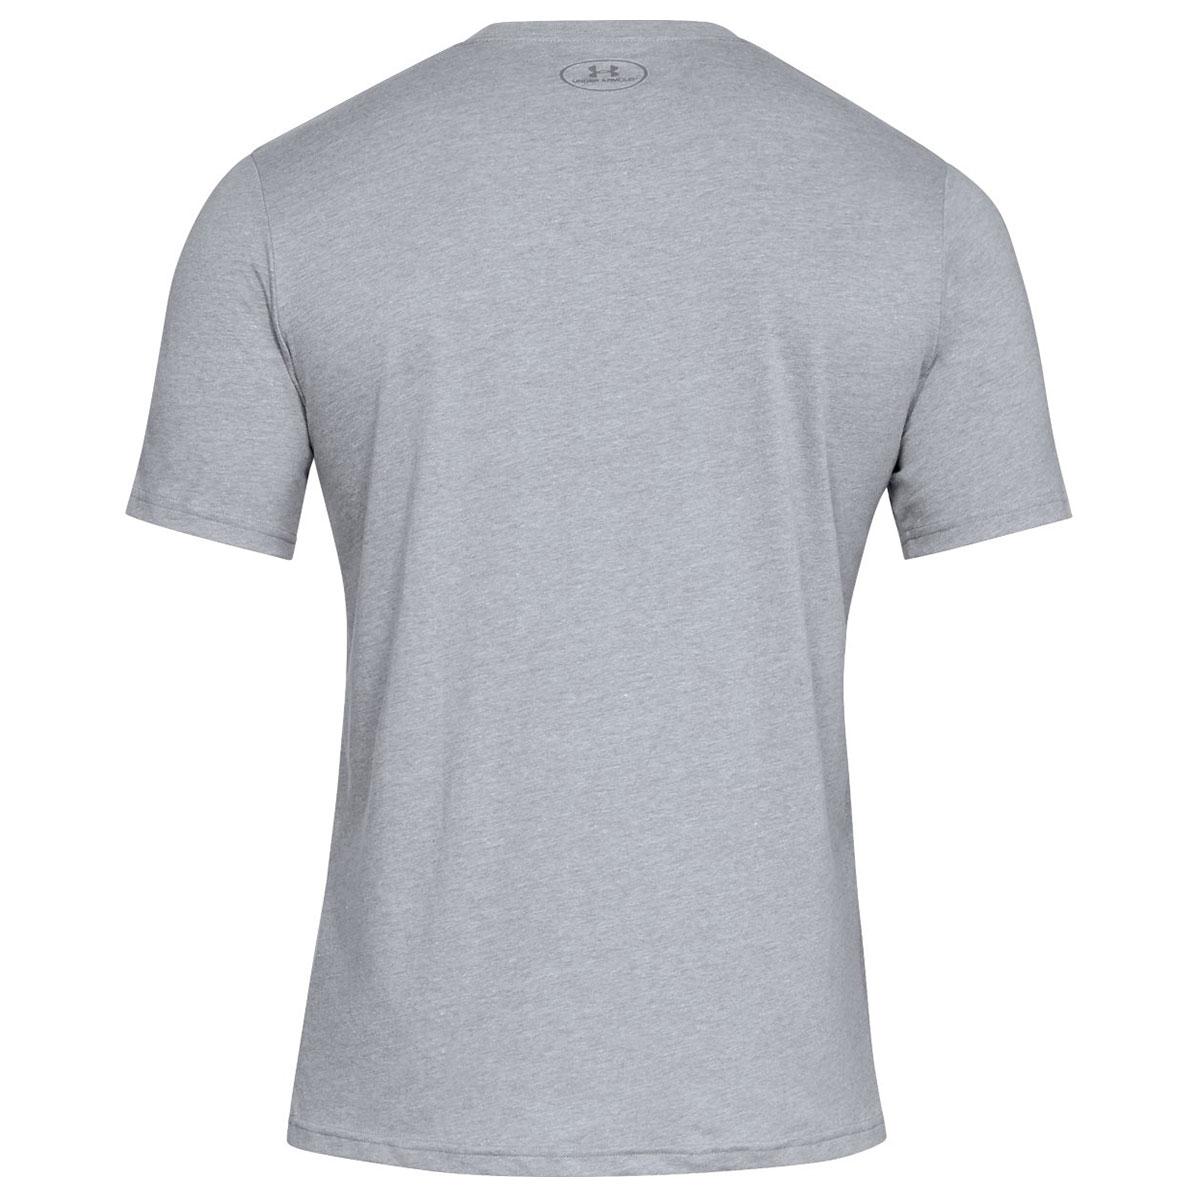 Under-Armour-Mens-2019-UA-Boxed-Sportstyle-HeatGear-Training-Gym-T-Shirt-Tee thumbnail 21